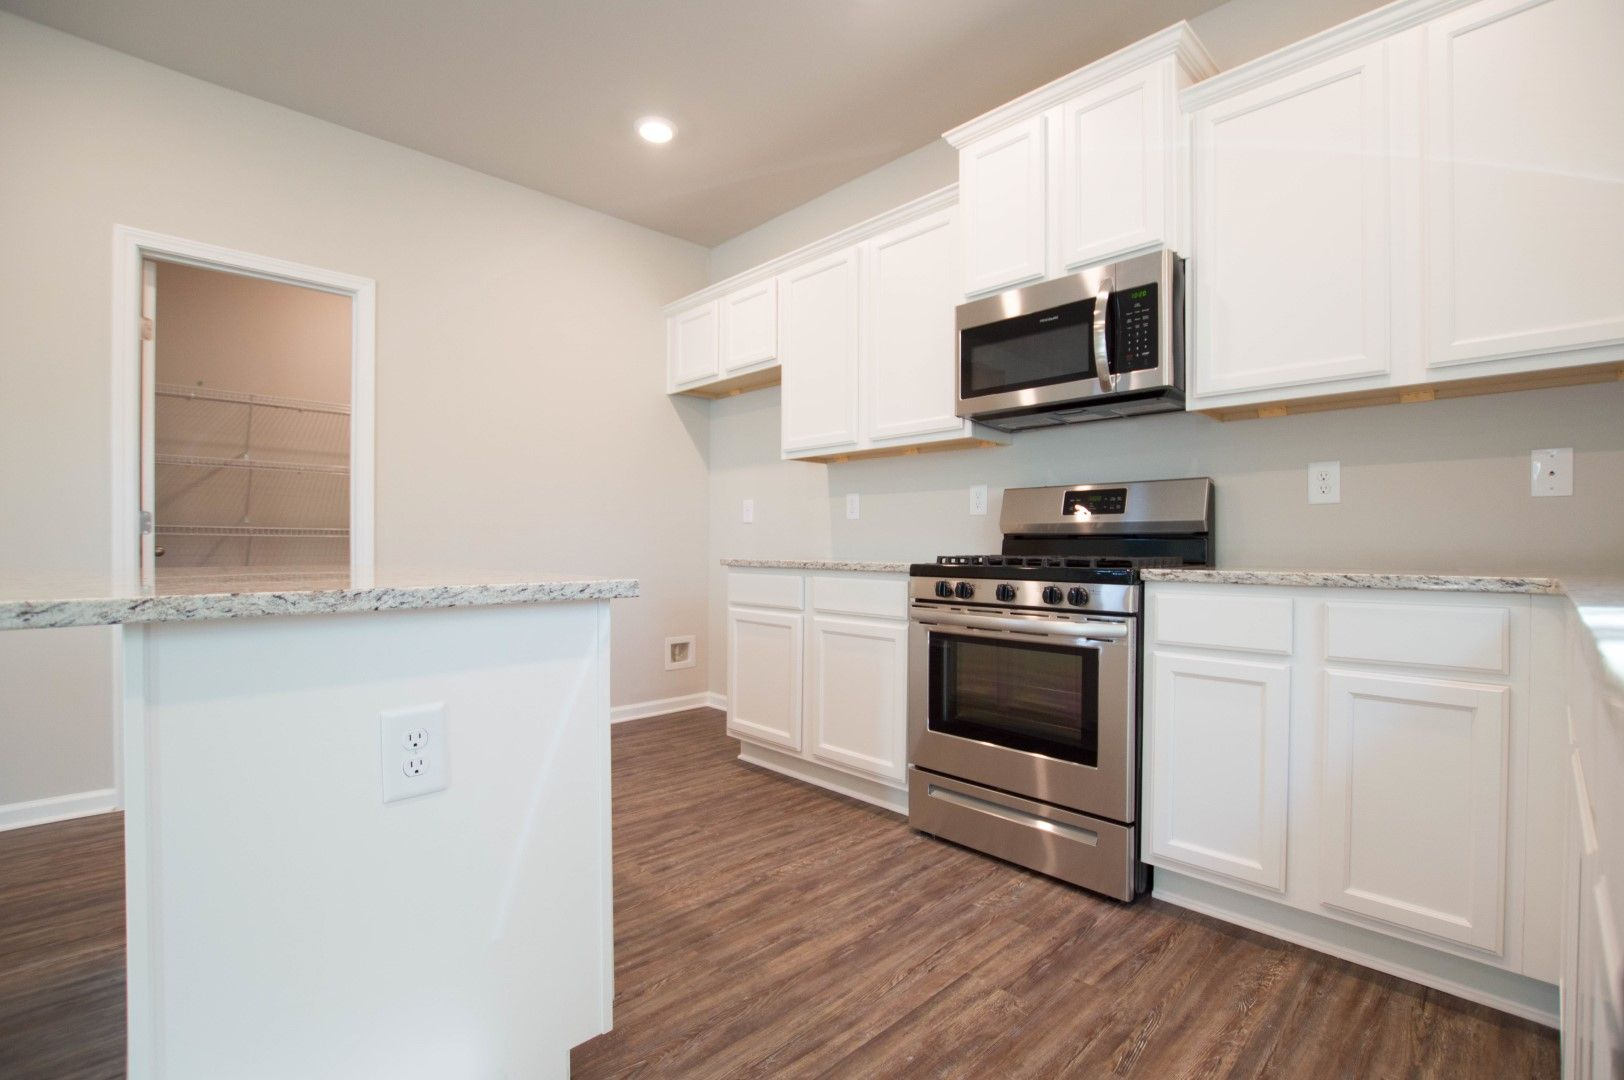 Kitchen featured in the Turnbridge By Piedmont Residential in Atlanta, GA